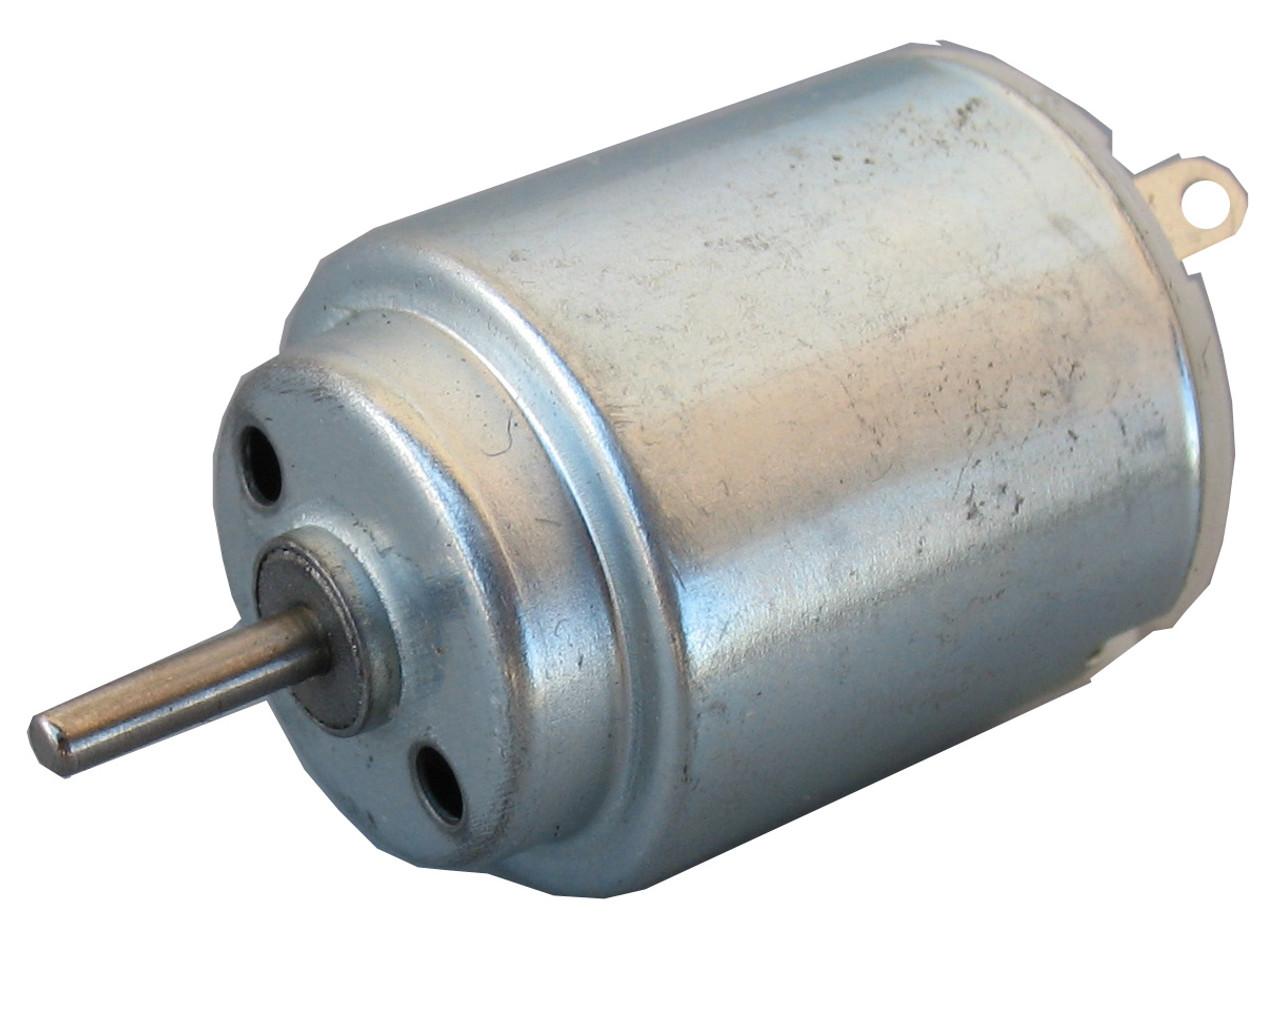 Toy motor, hobby motor, DC motor, miniature motor, small motor, low voltage motor. Round